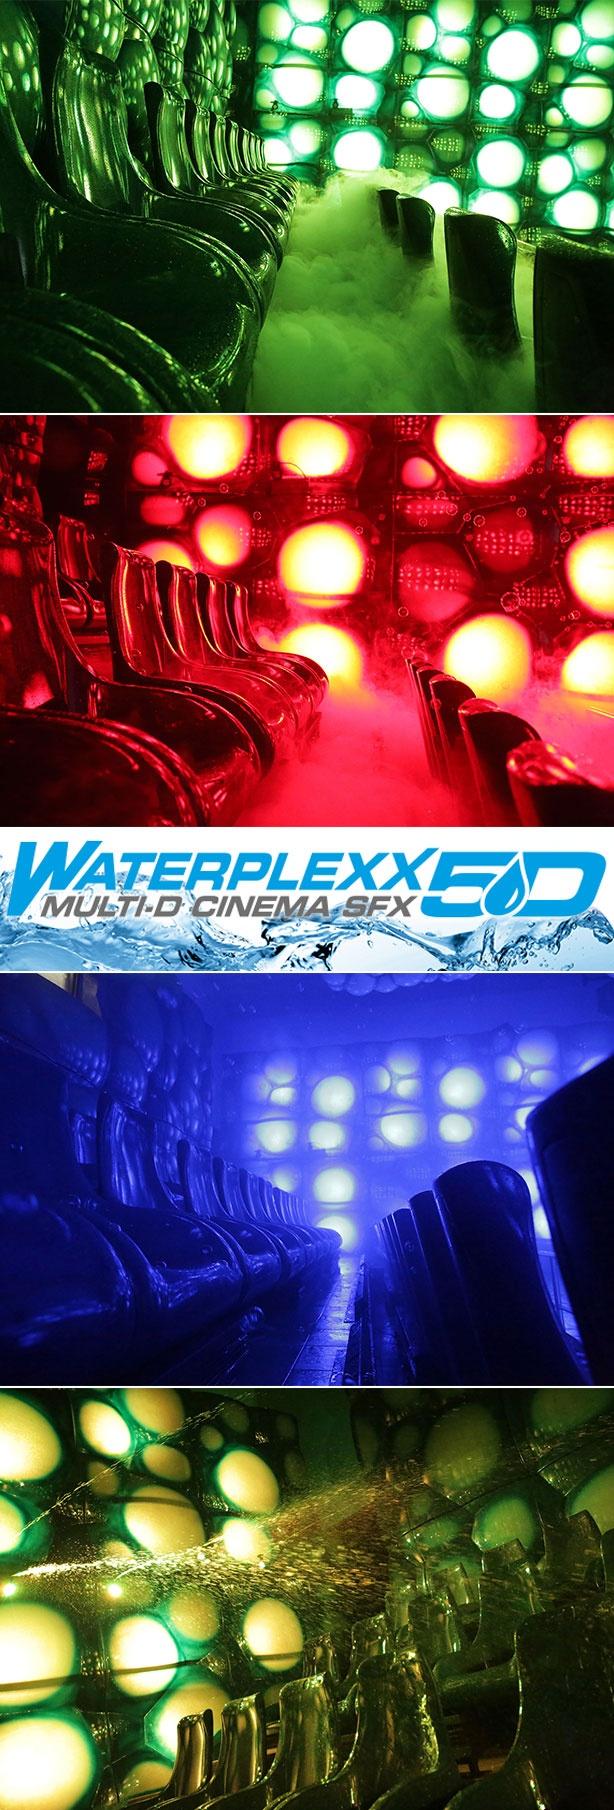 Waterplexx 5D // © 2012 Kraftwerk Living Technologies // www.kraftwerk.at